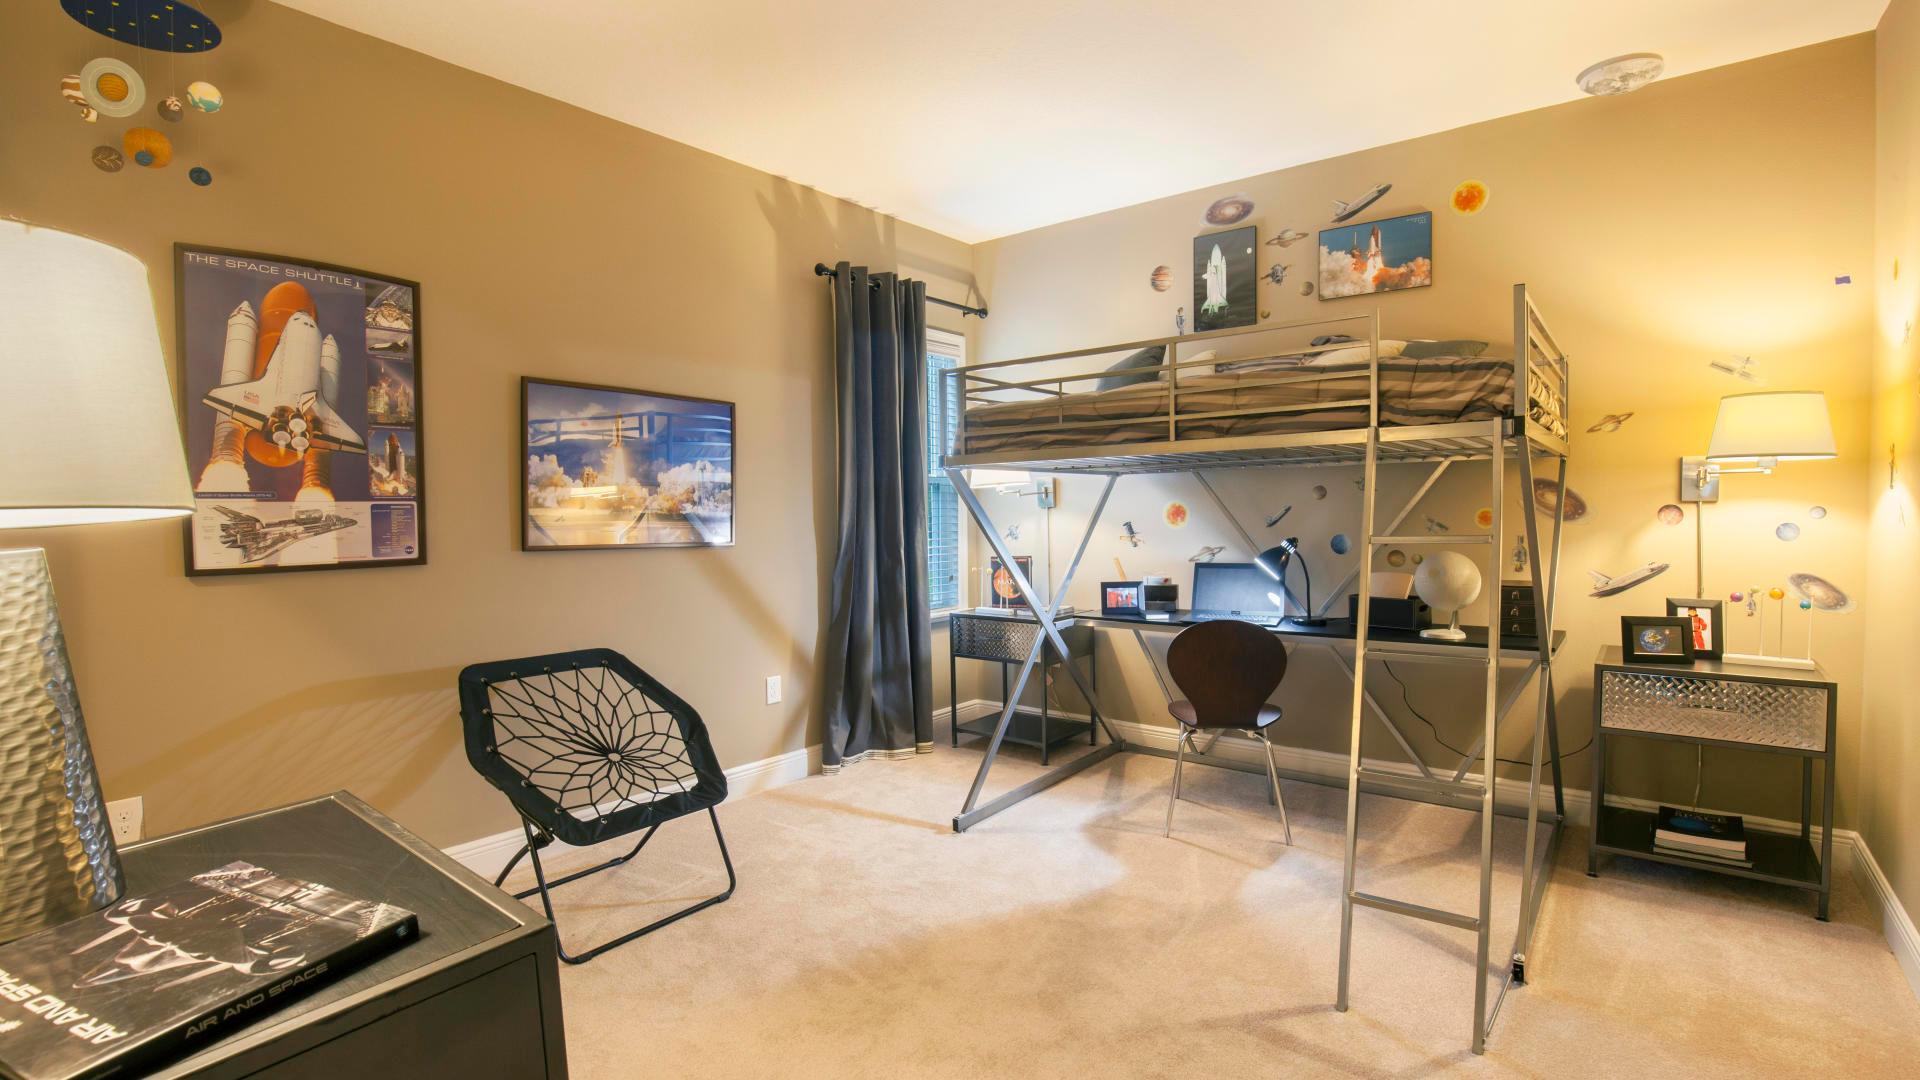 Bedroom featured in the Livorno By Maronda Homes in Daytona Beach, FL